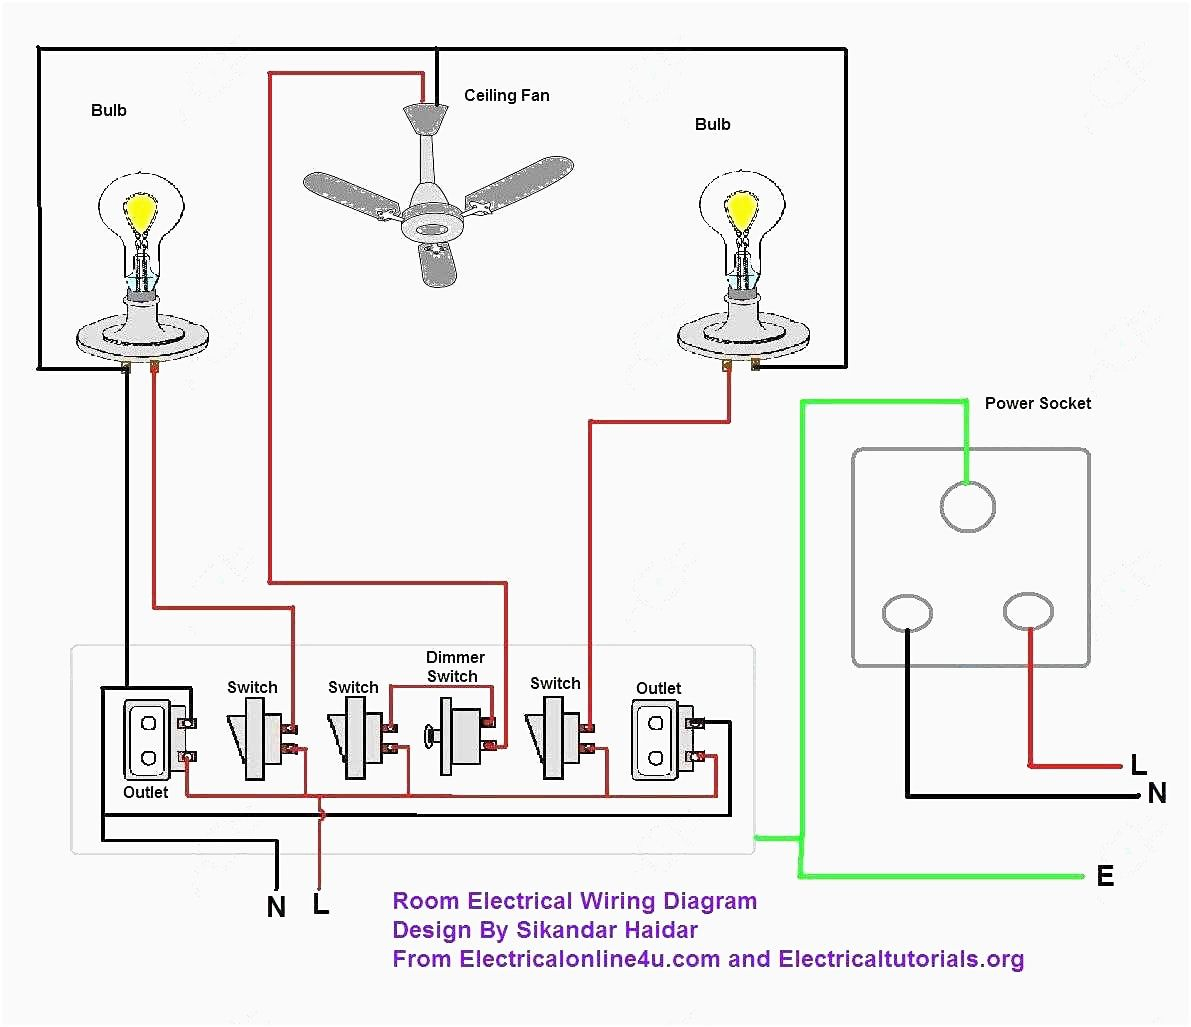 Ceiling Fan Wiring Diagram Wiring Schematics For Dummies Wiring Diagram Section